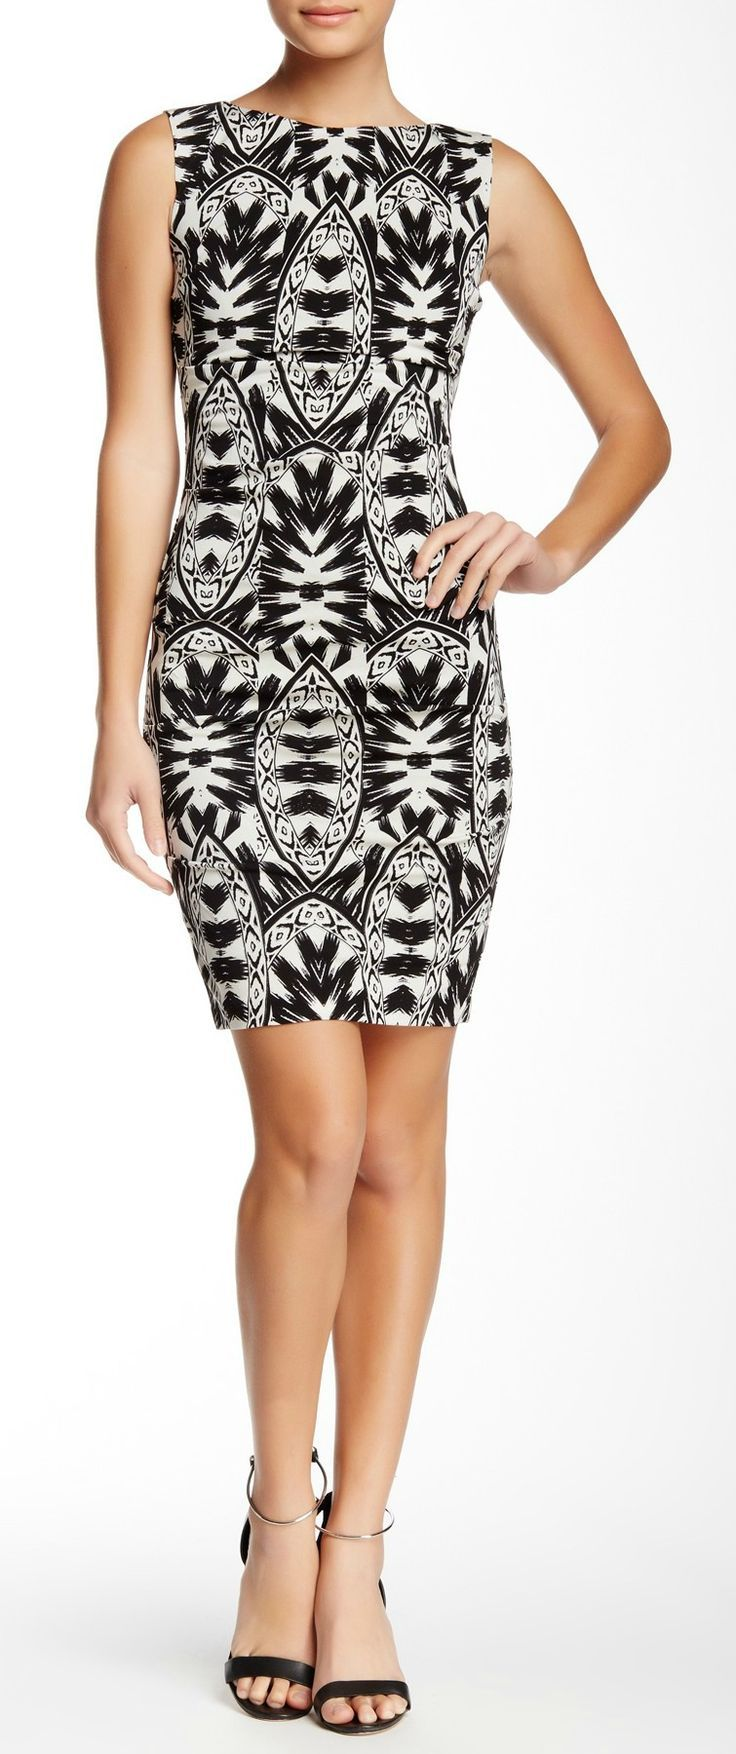 This Nicole MIller dress is 85% off @Nordstrom Rack!!! #Nordstrom Rack #anordst…